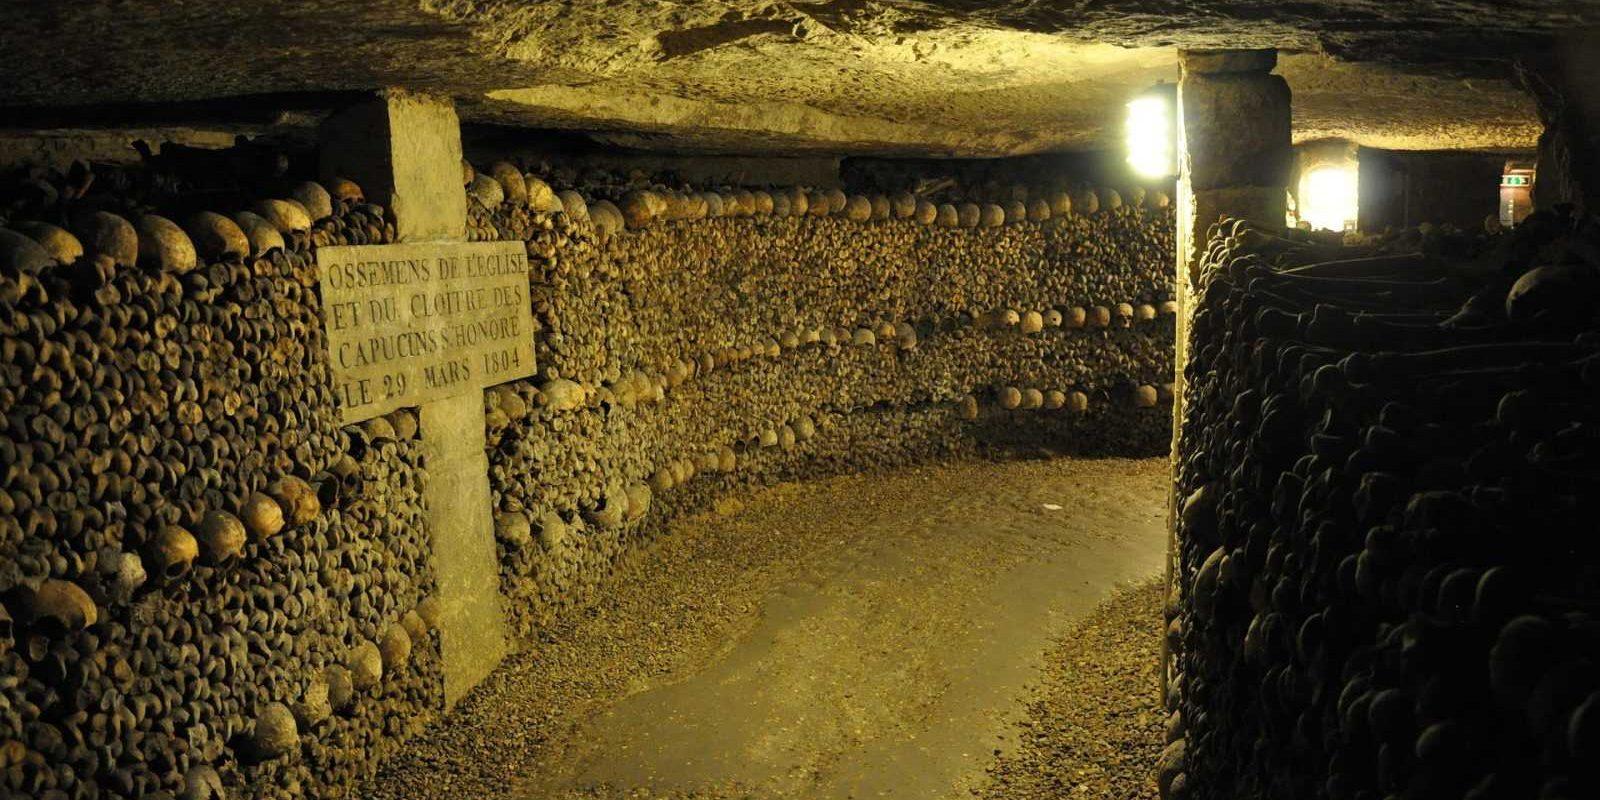 Catacombs, Cemetery, Paris FRANCE